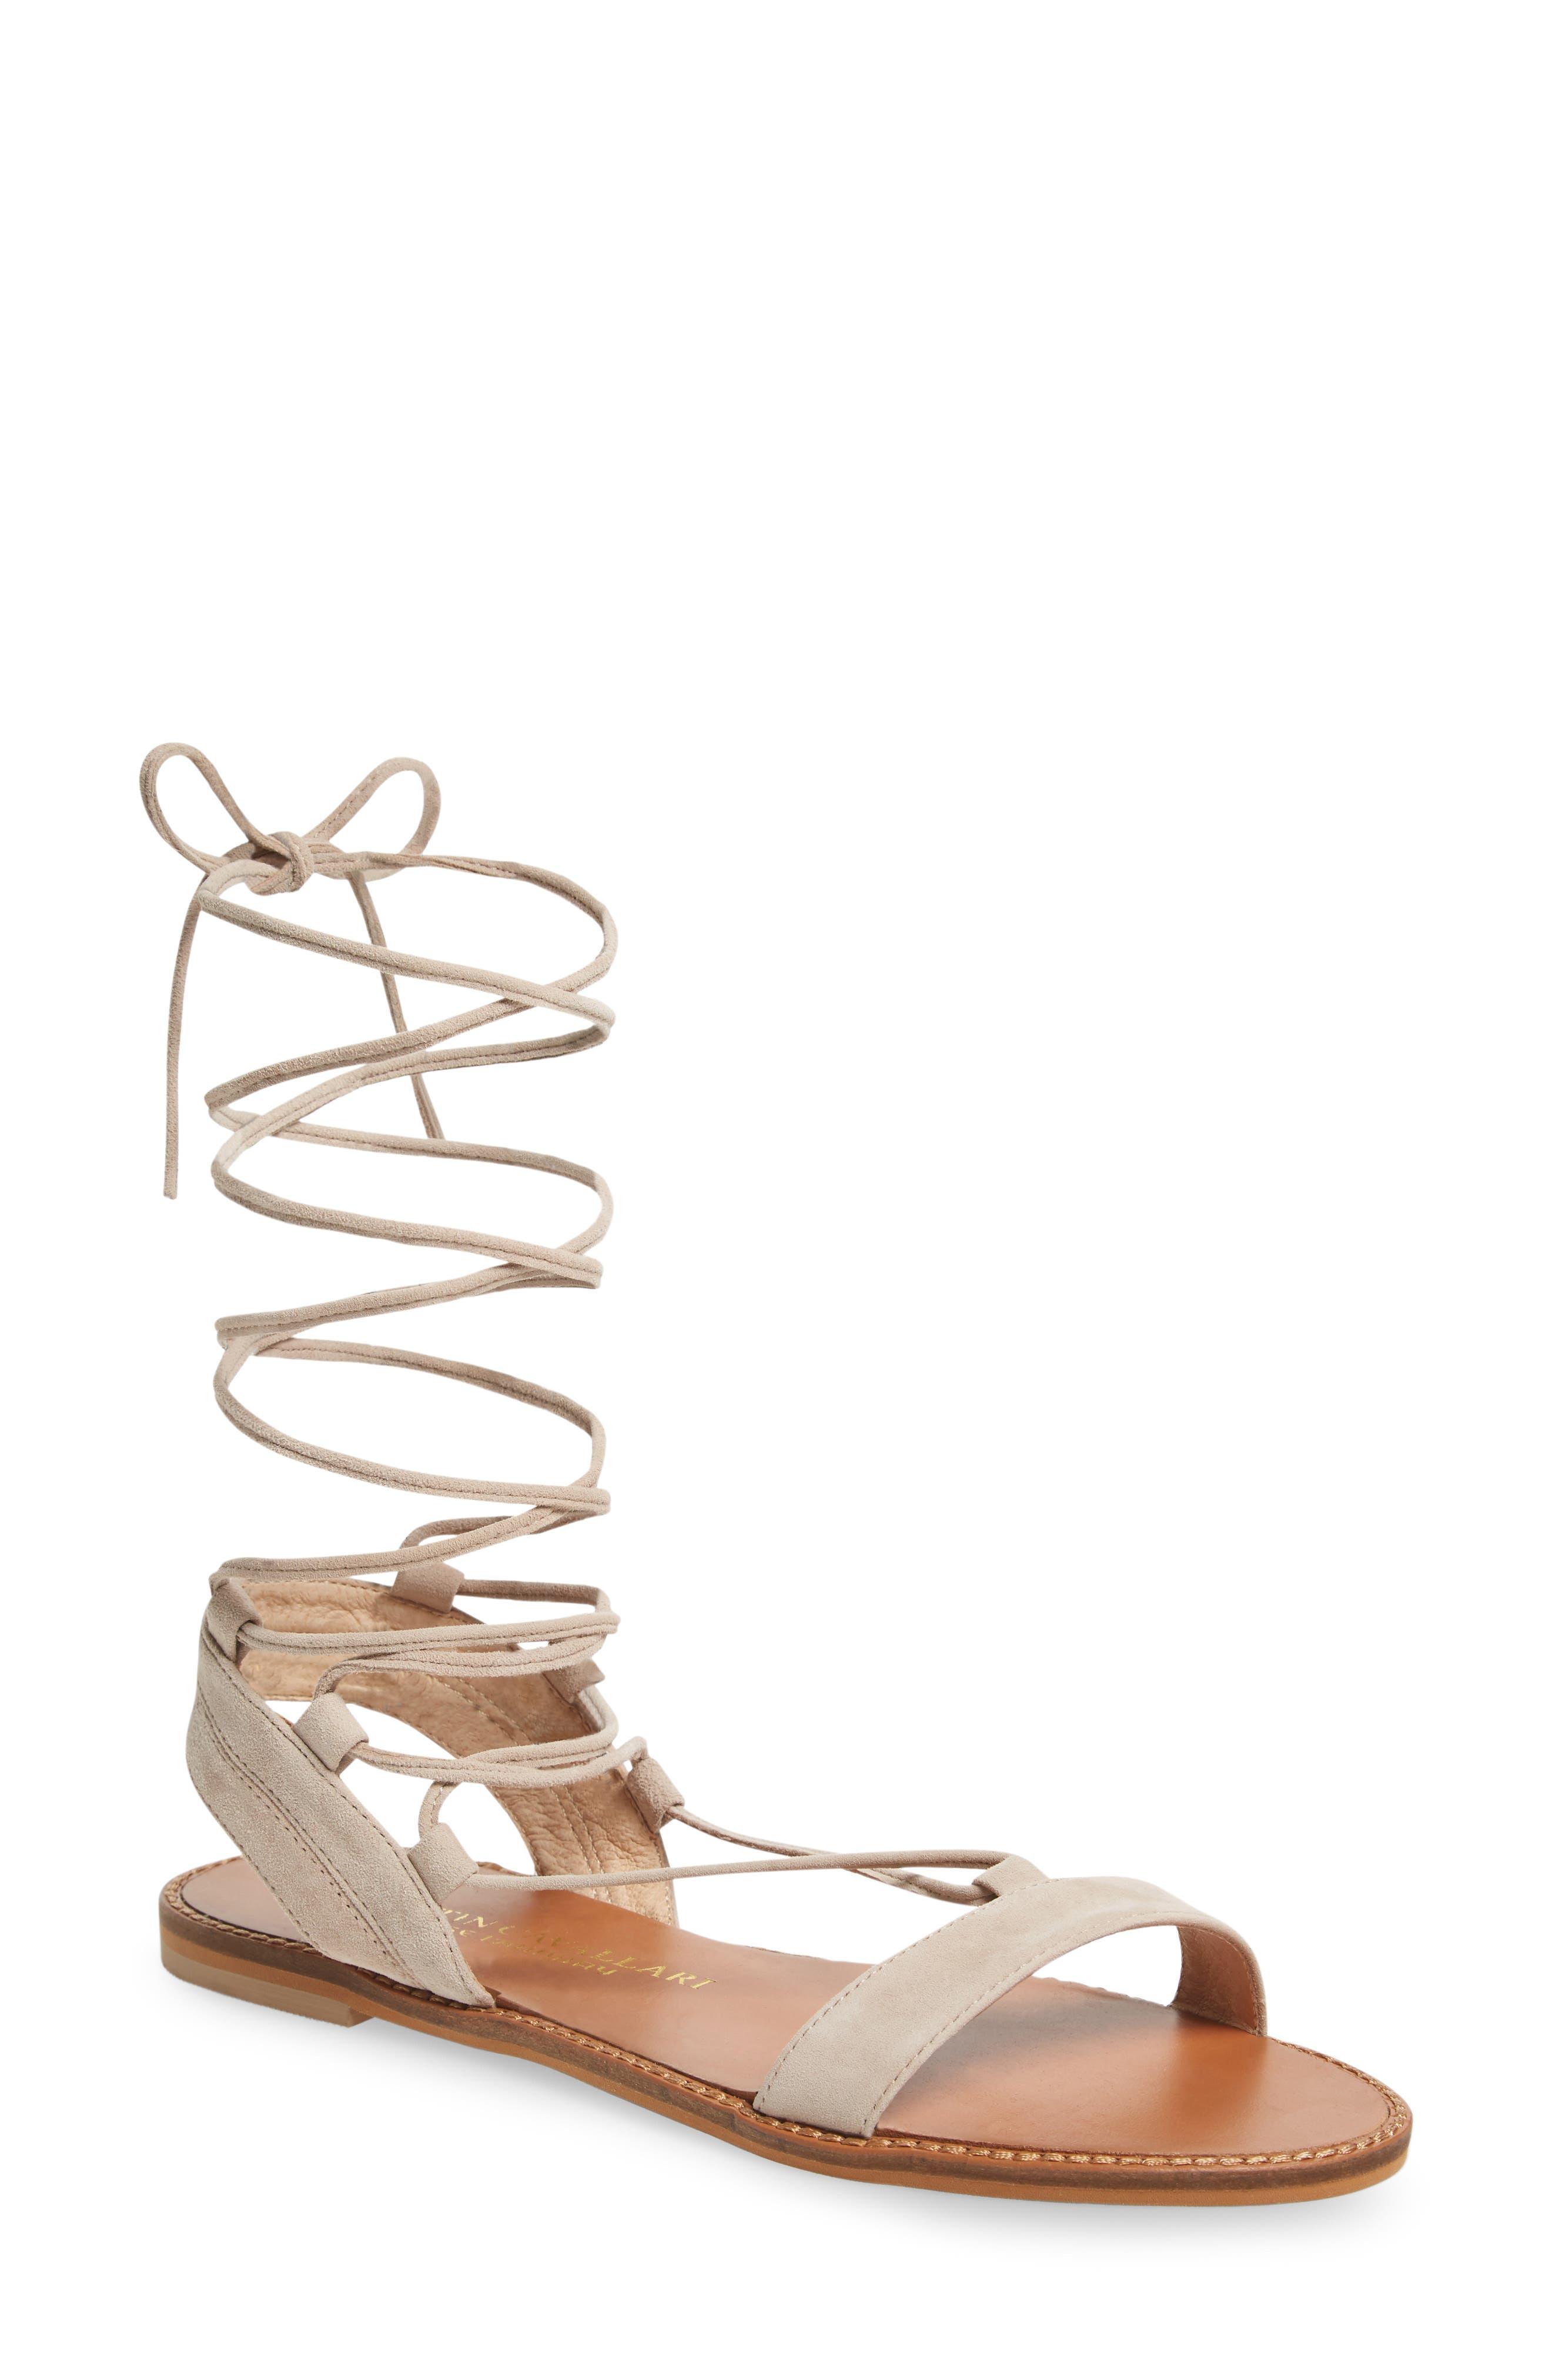 Brea Ankle Wrap Sandal,                         Main,                         color, Mushroom